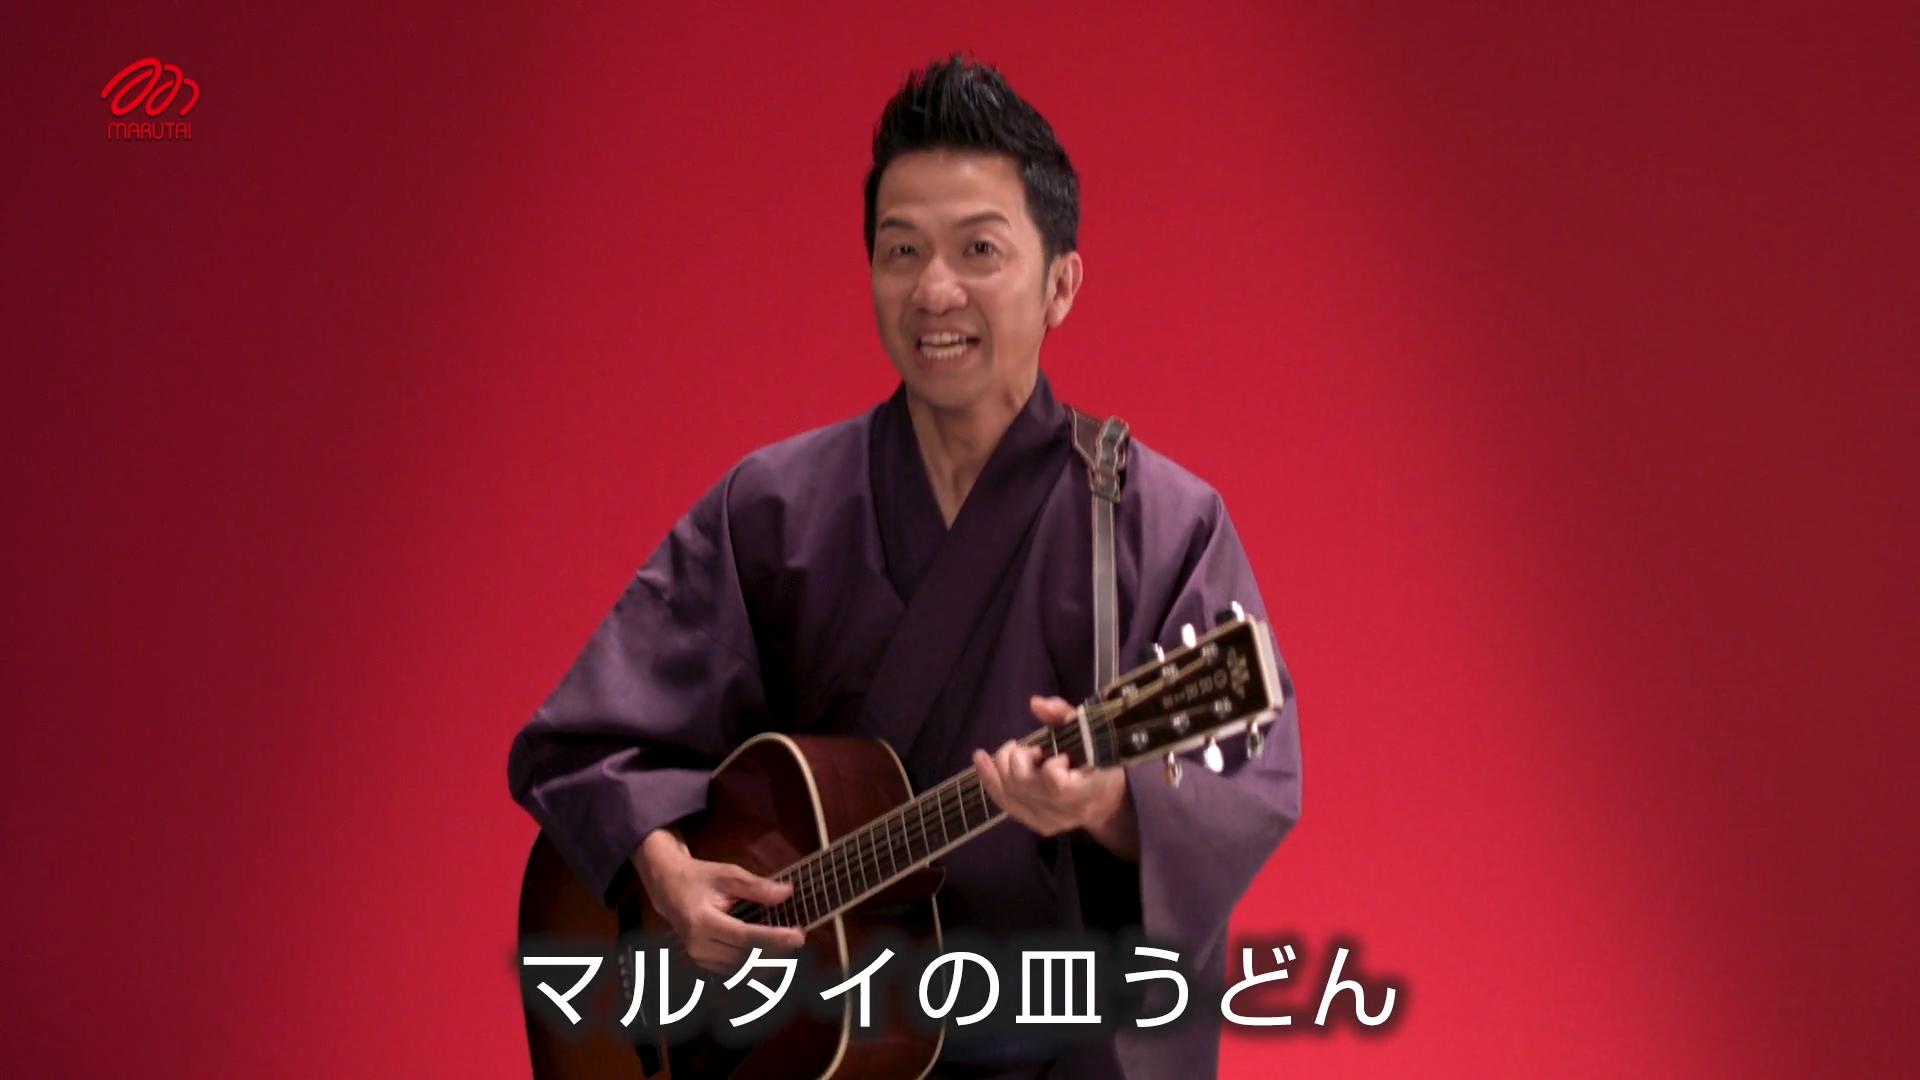 陽 区 波田